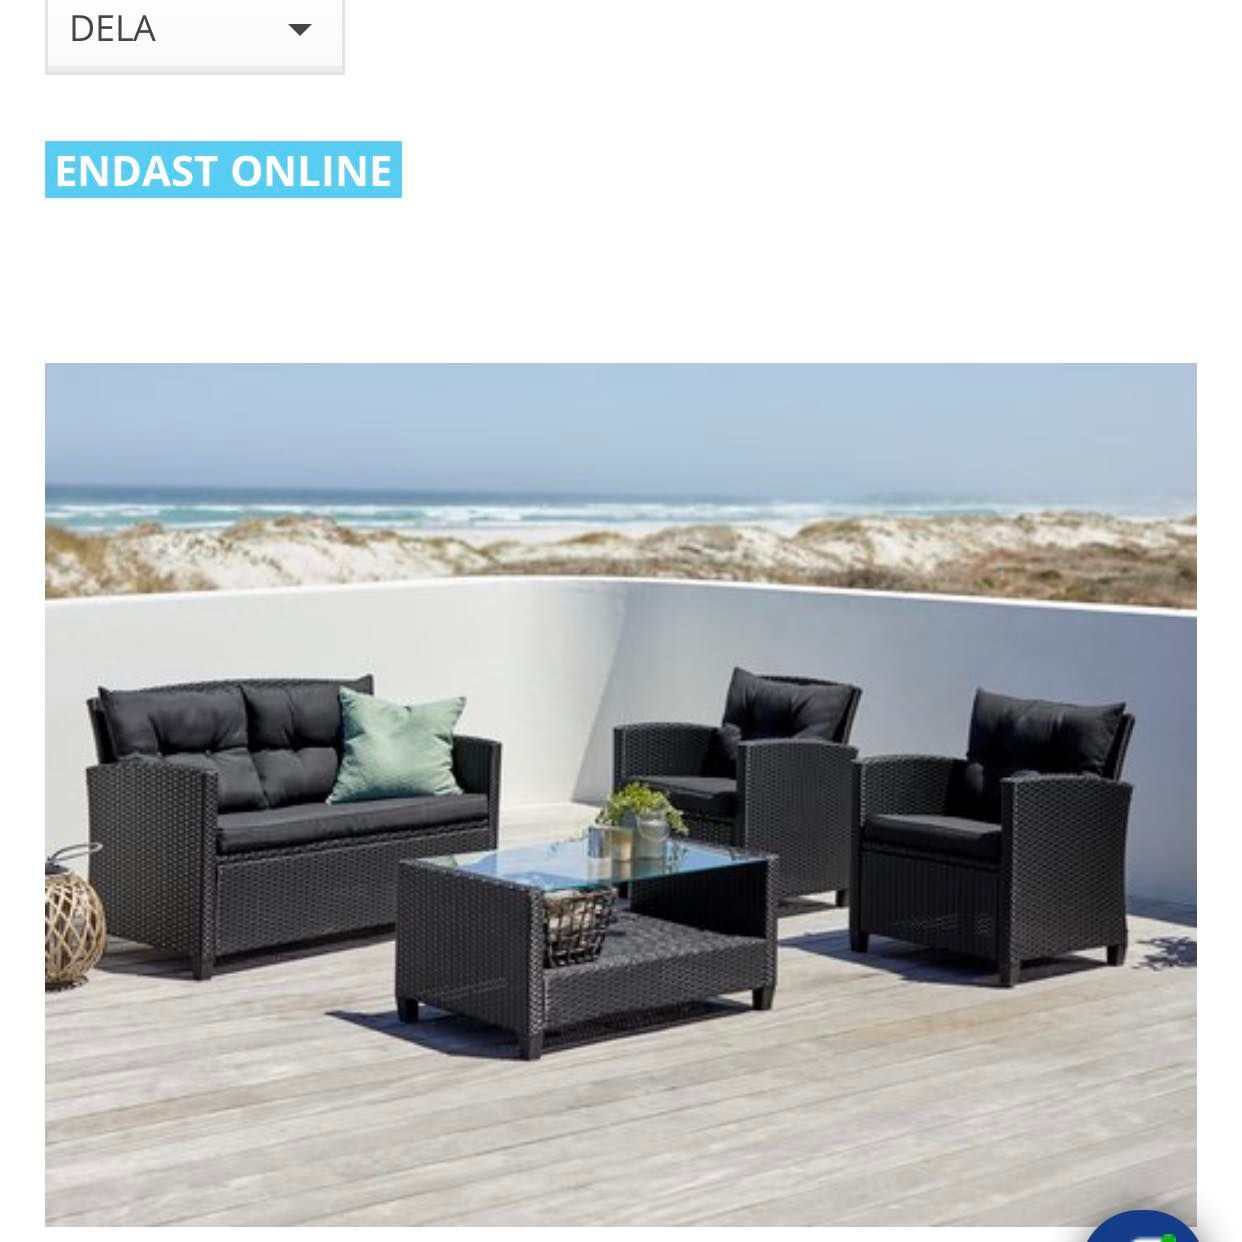 image of 4 olika möbler -